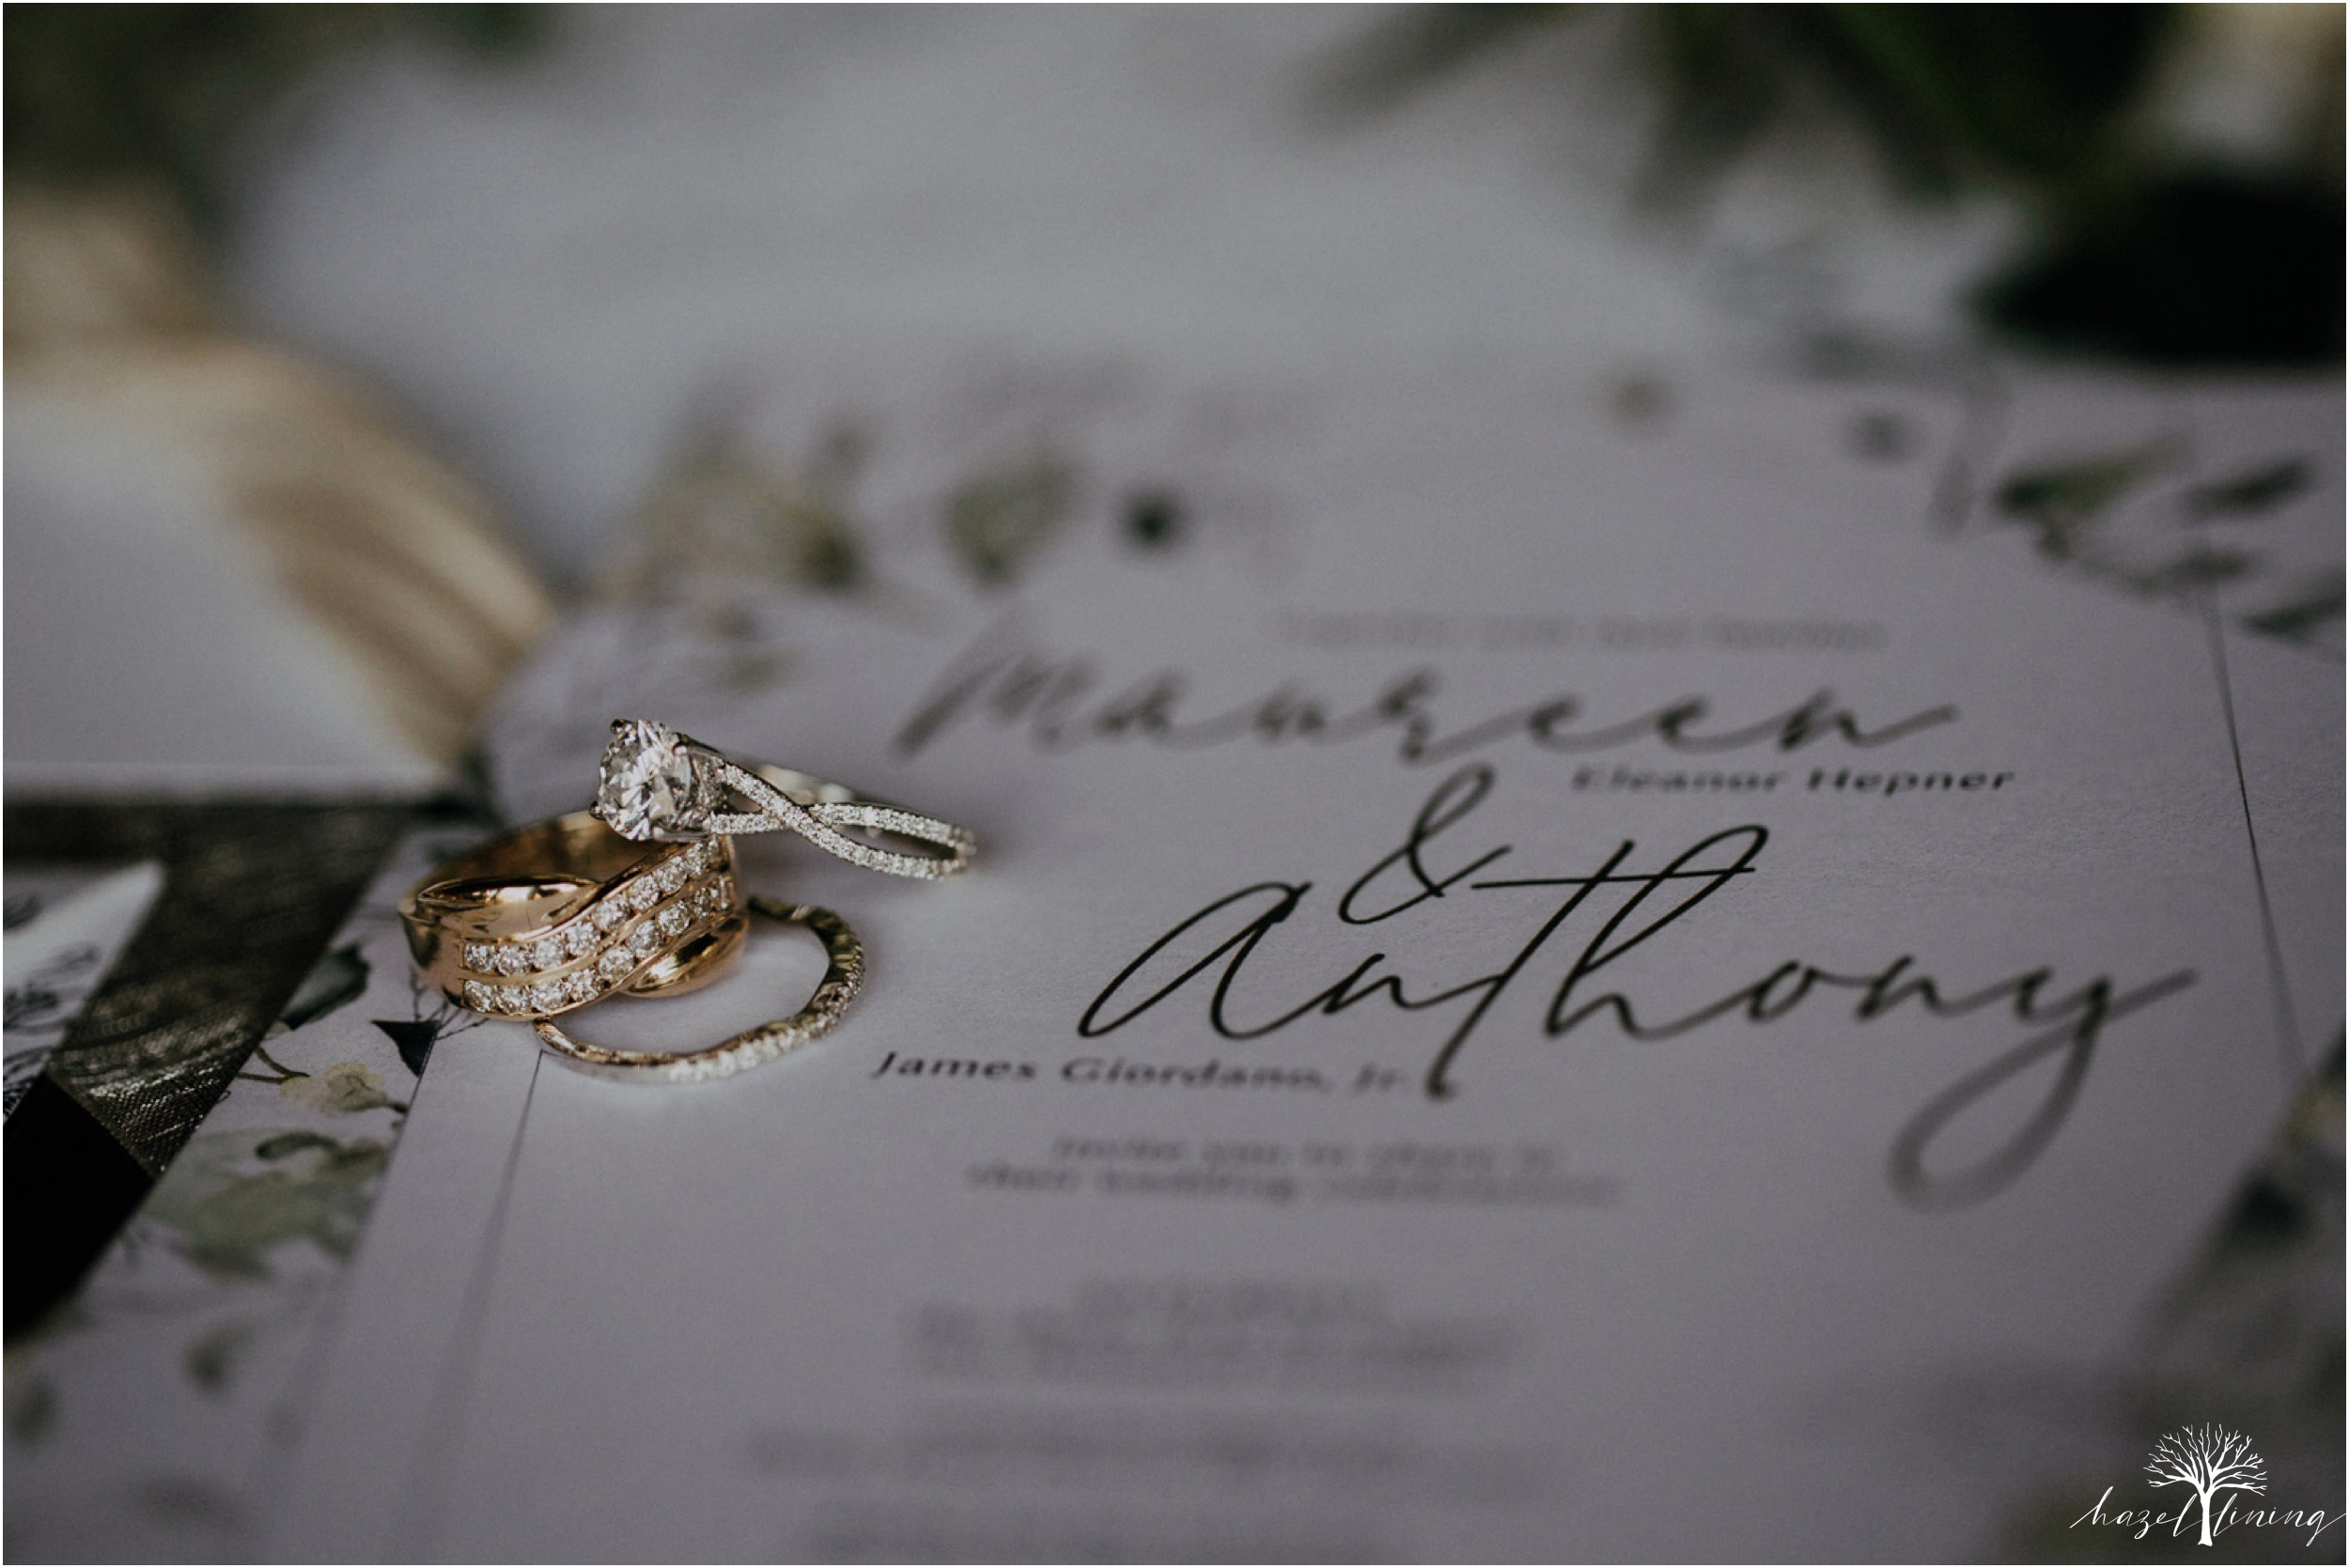 maureen-hepner-anthony-giordano-rose-bank-winery-newtow-pennsylvania-luxury-summer-wedding-hazel-lining-photography-destination-elopement-wedding-engagement-photography_0004.jpg